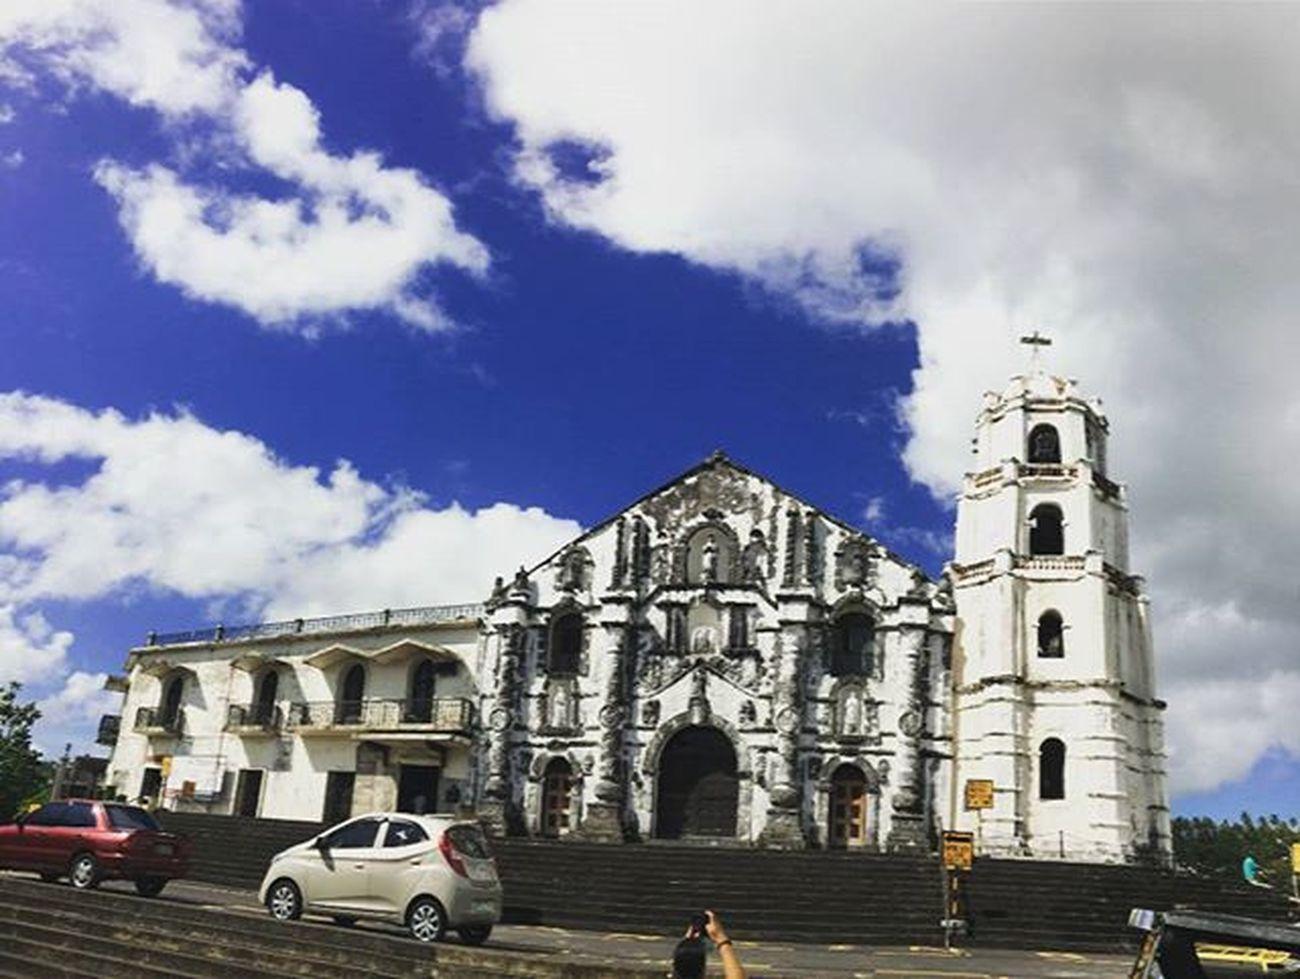 ⛪ 11/21/15 Itsmorefuninbicol Itsmorefuninthephilippines Philippines Bicol Daragaalbay Daraga Igersmanila Wheninmanila Wheninalbay Pilipinas